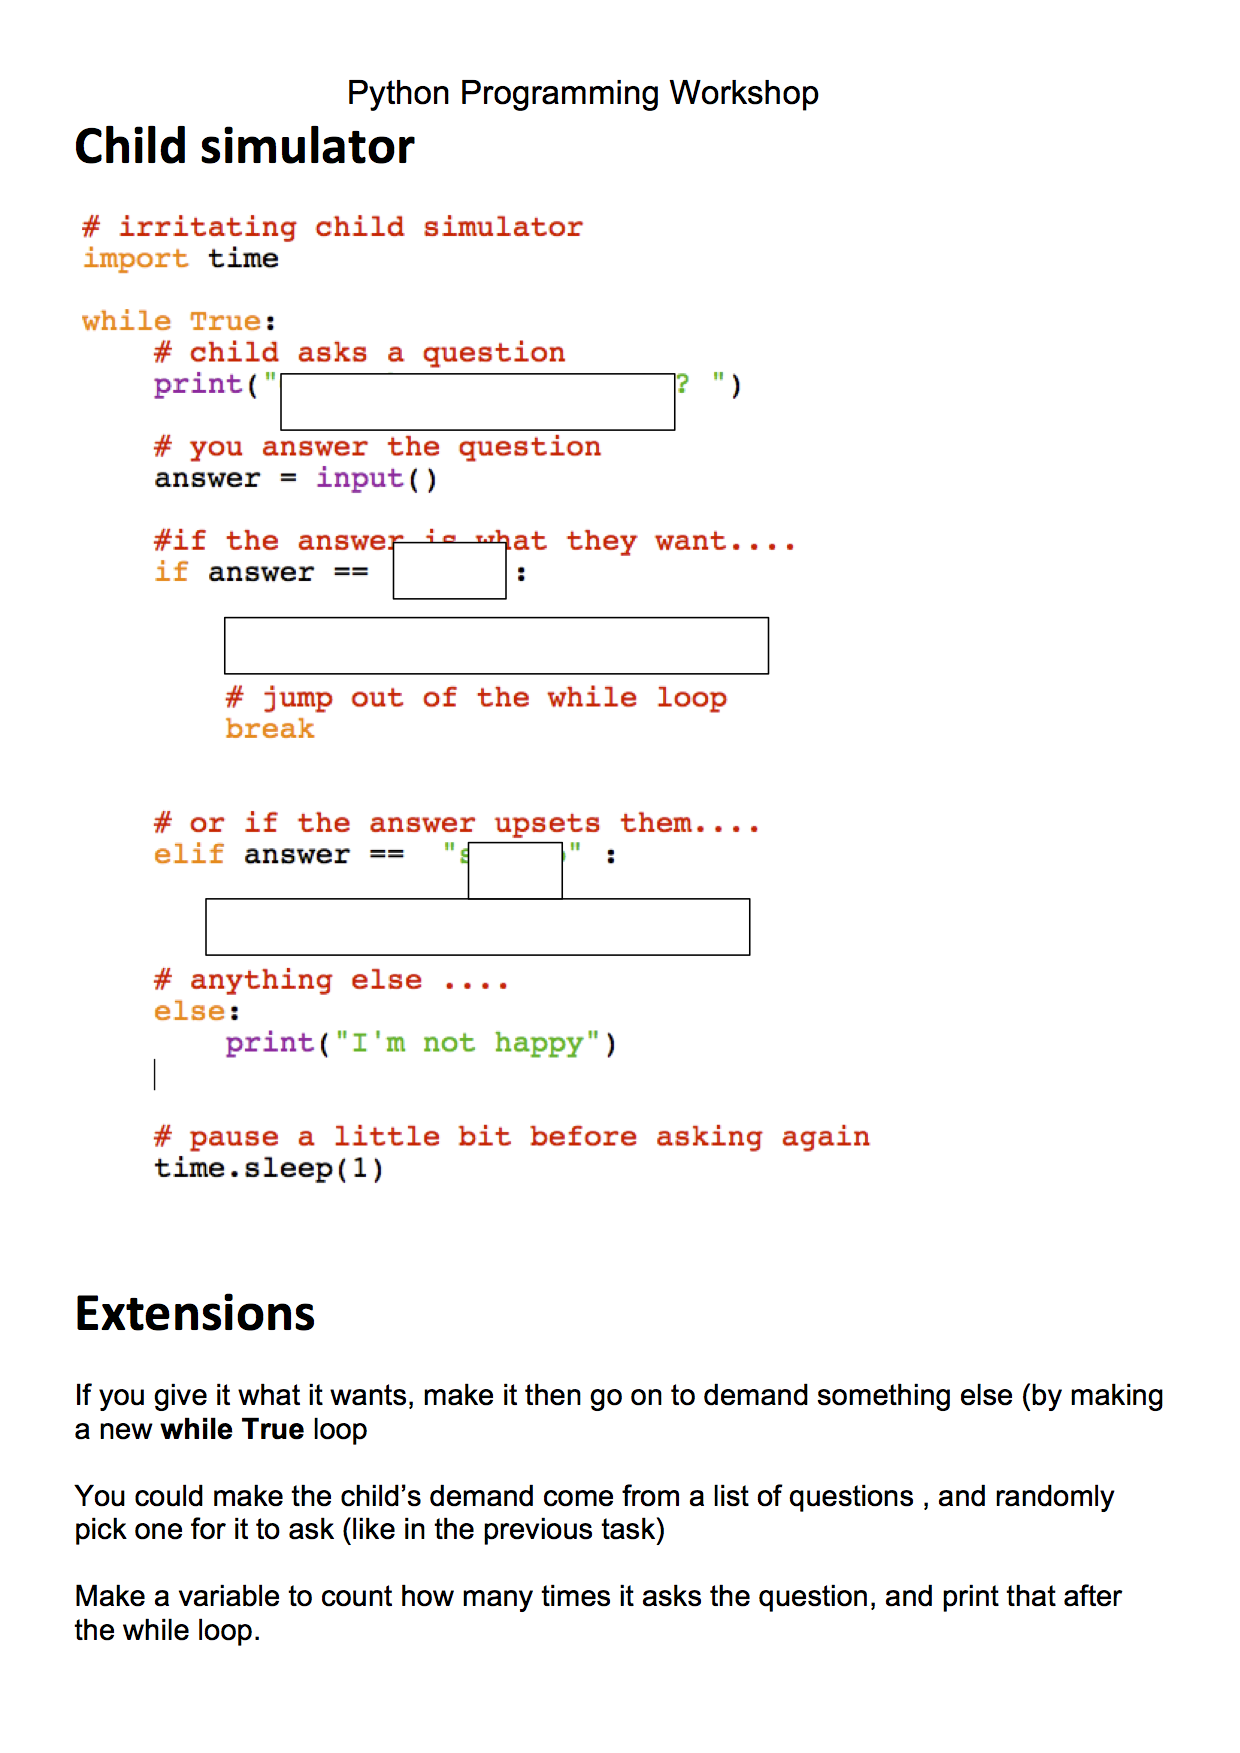 Python Worksheet Worksheets for all | Download and Share ...